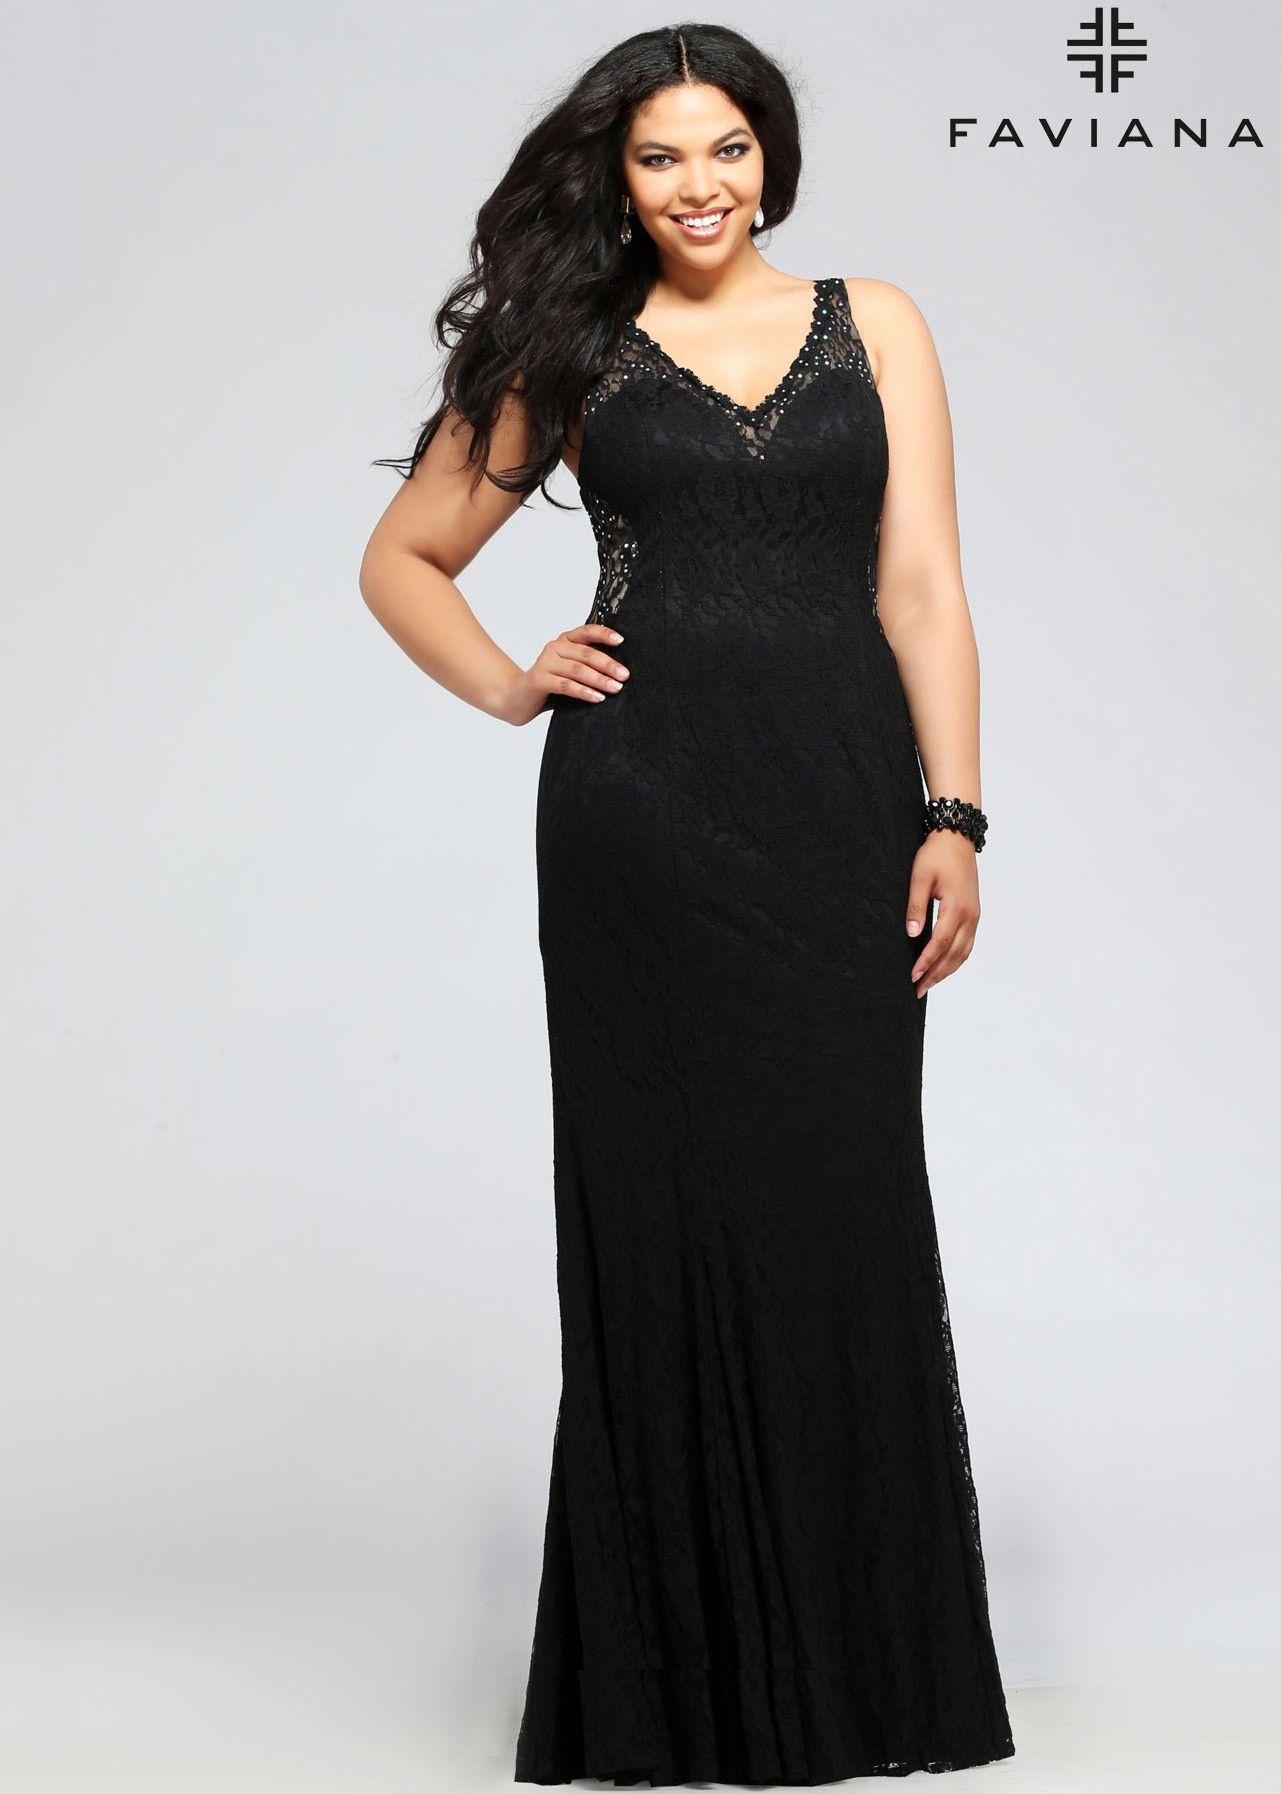 Faviana 9386 V-Neck Lace Plus Size Evening Dress | Prom, Black laces ...